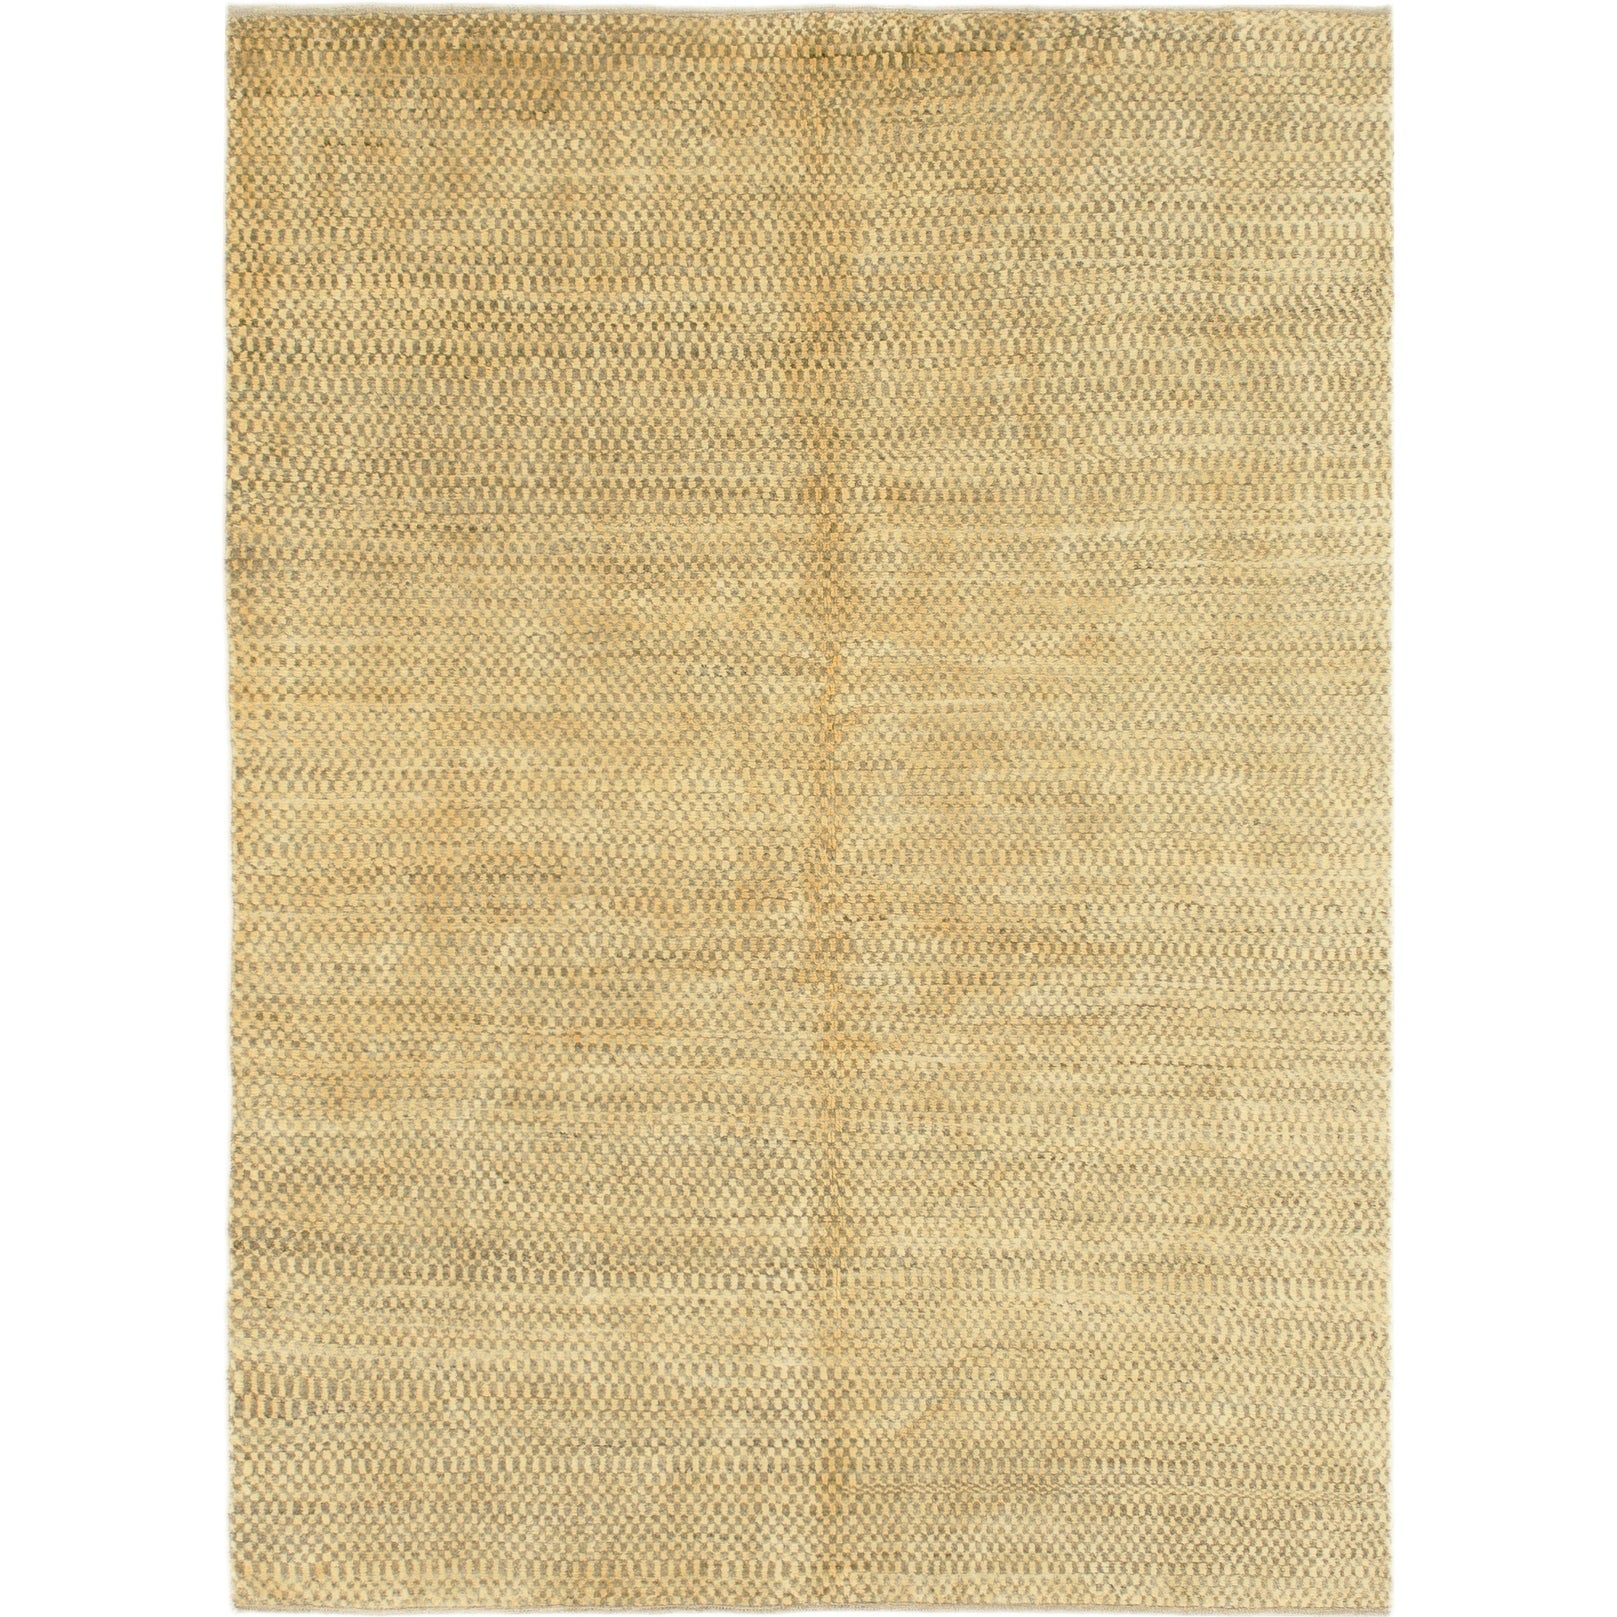 Hand Knotted Kashkuli Gabbeh Wool Area Rug - 4 10 x 6 8 (Gold - 4 10 x 6 8)